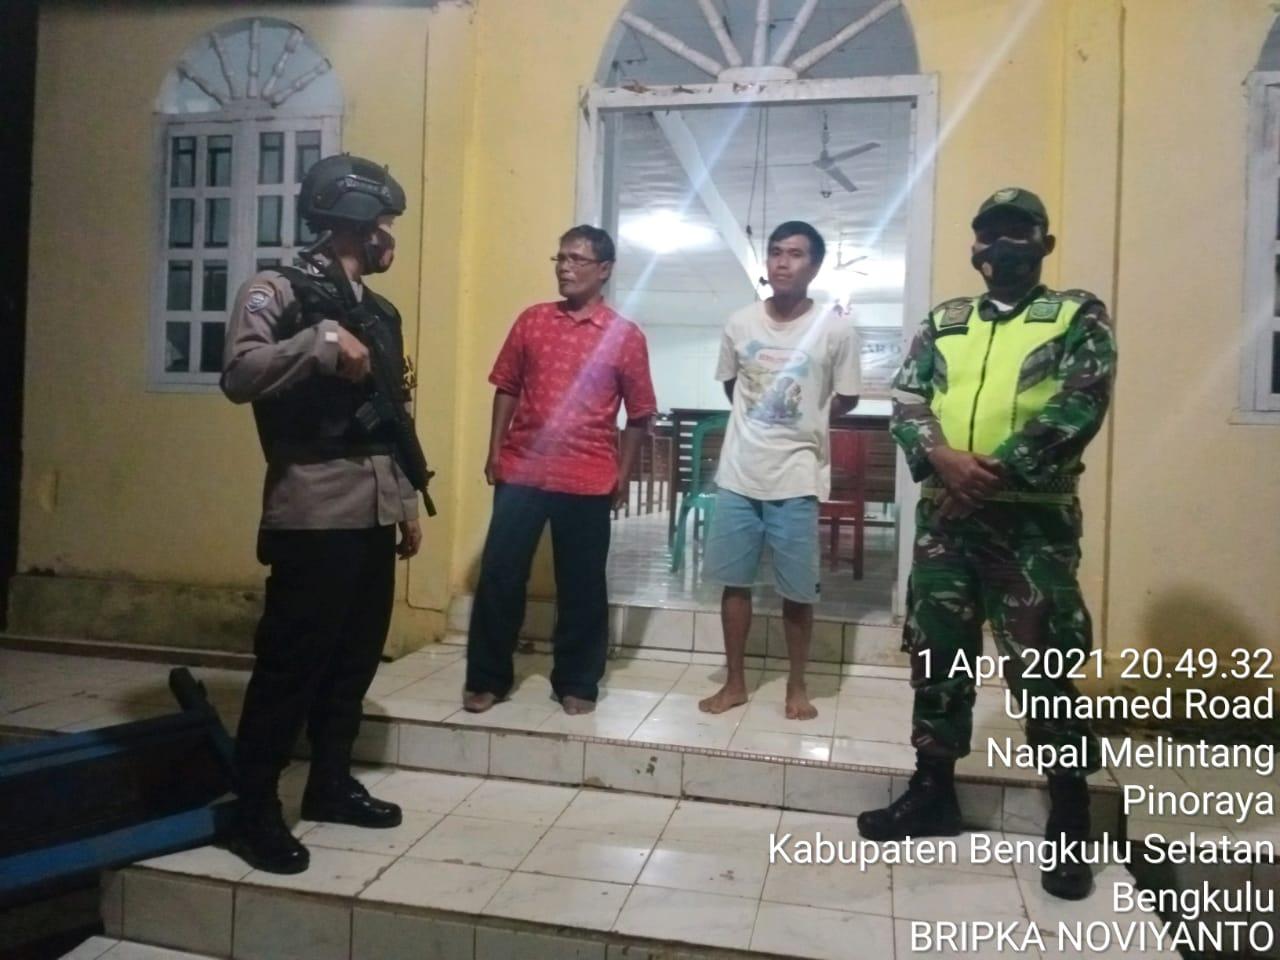 Amankan Perayaan Wafatnya Isa Al-Masih, Polda Bengkulu Dan Polres Jajaran Amankan Puluhan Gereja